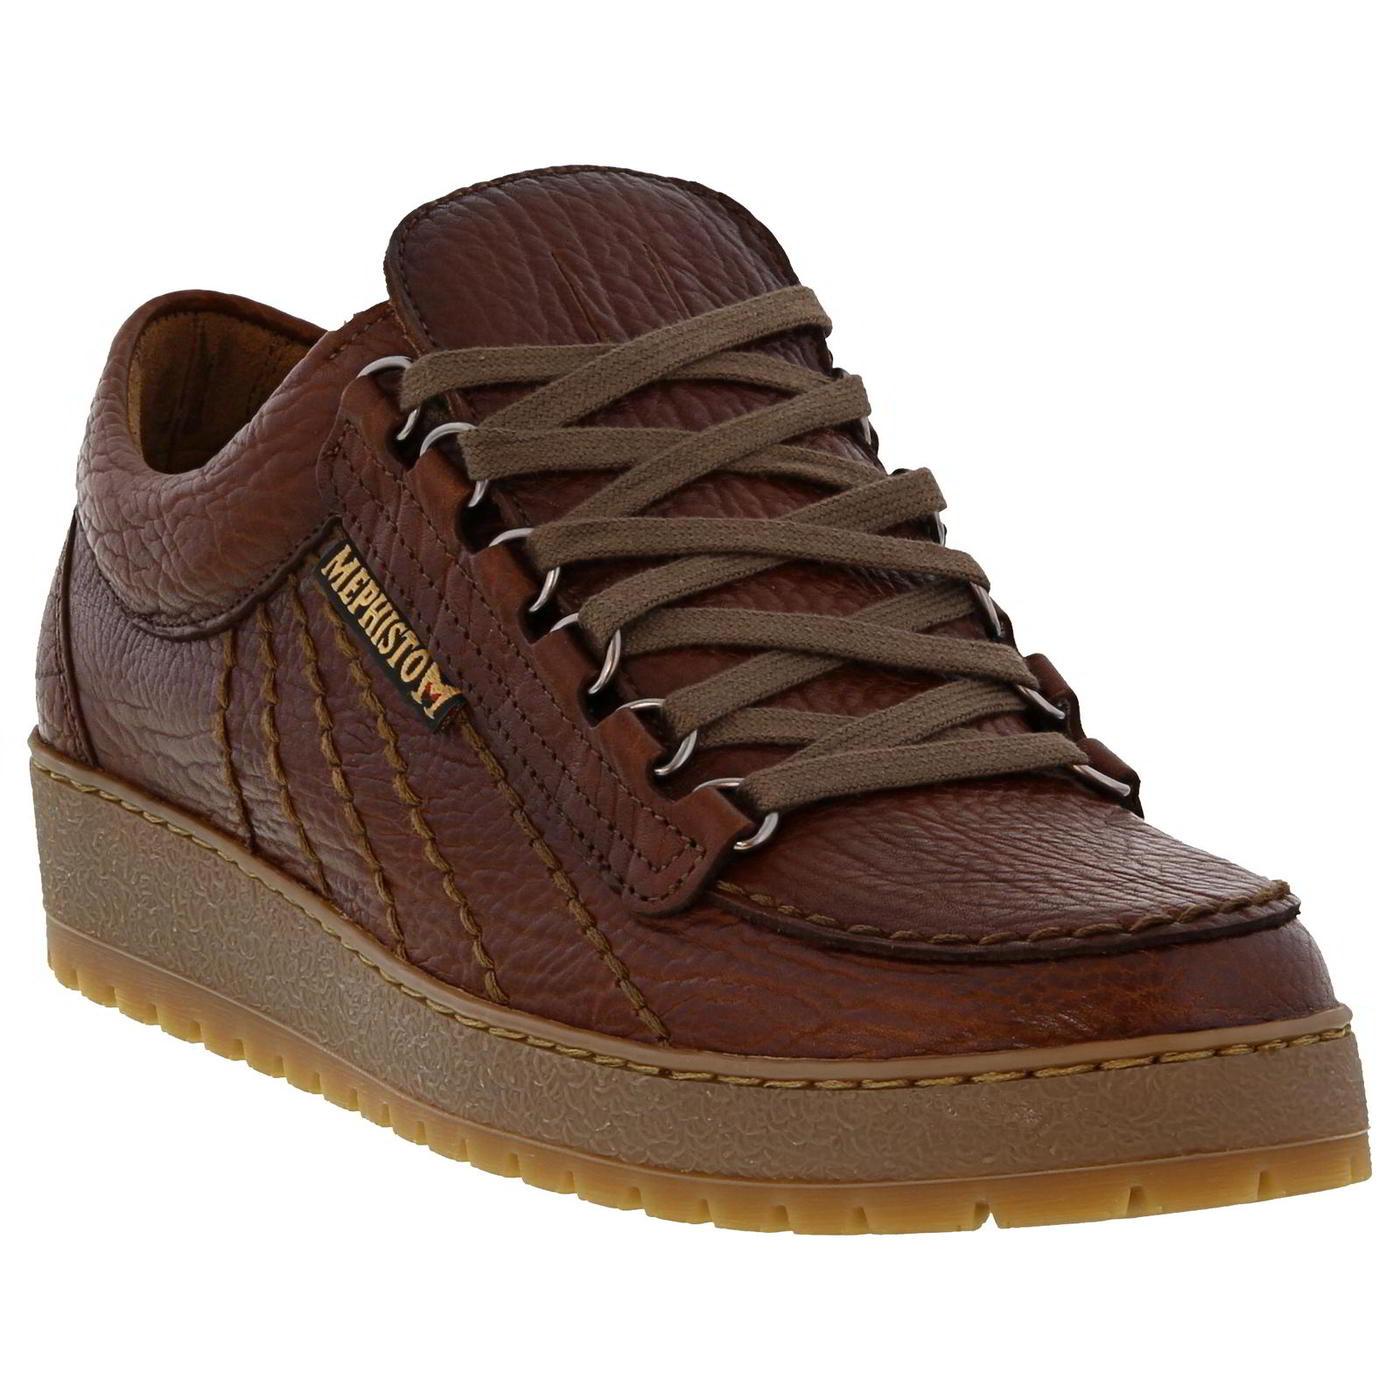 Mephisto Mens Rainbow Heritage Walking Shoes - Desert